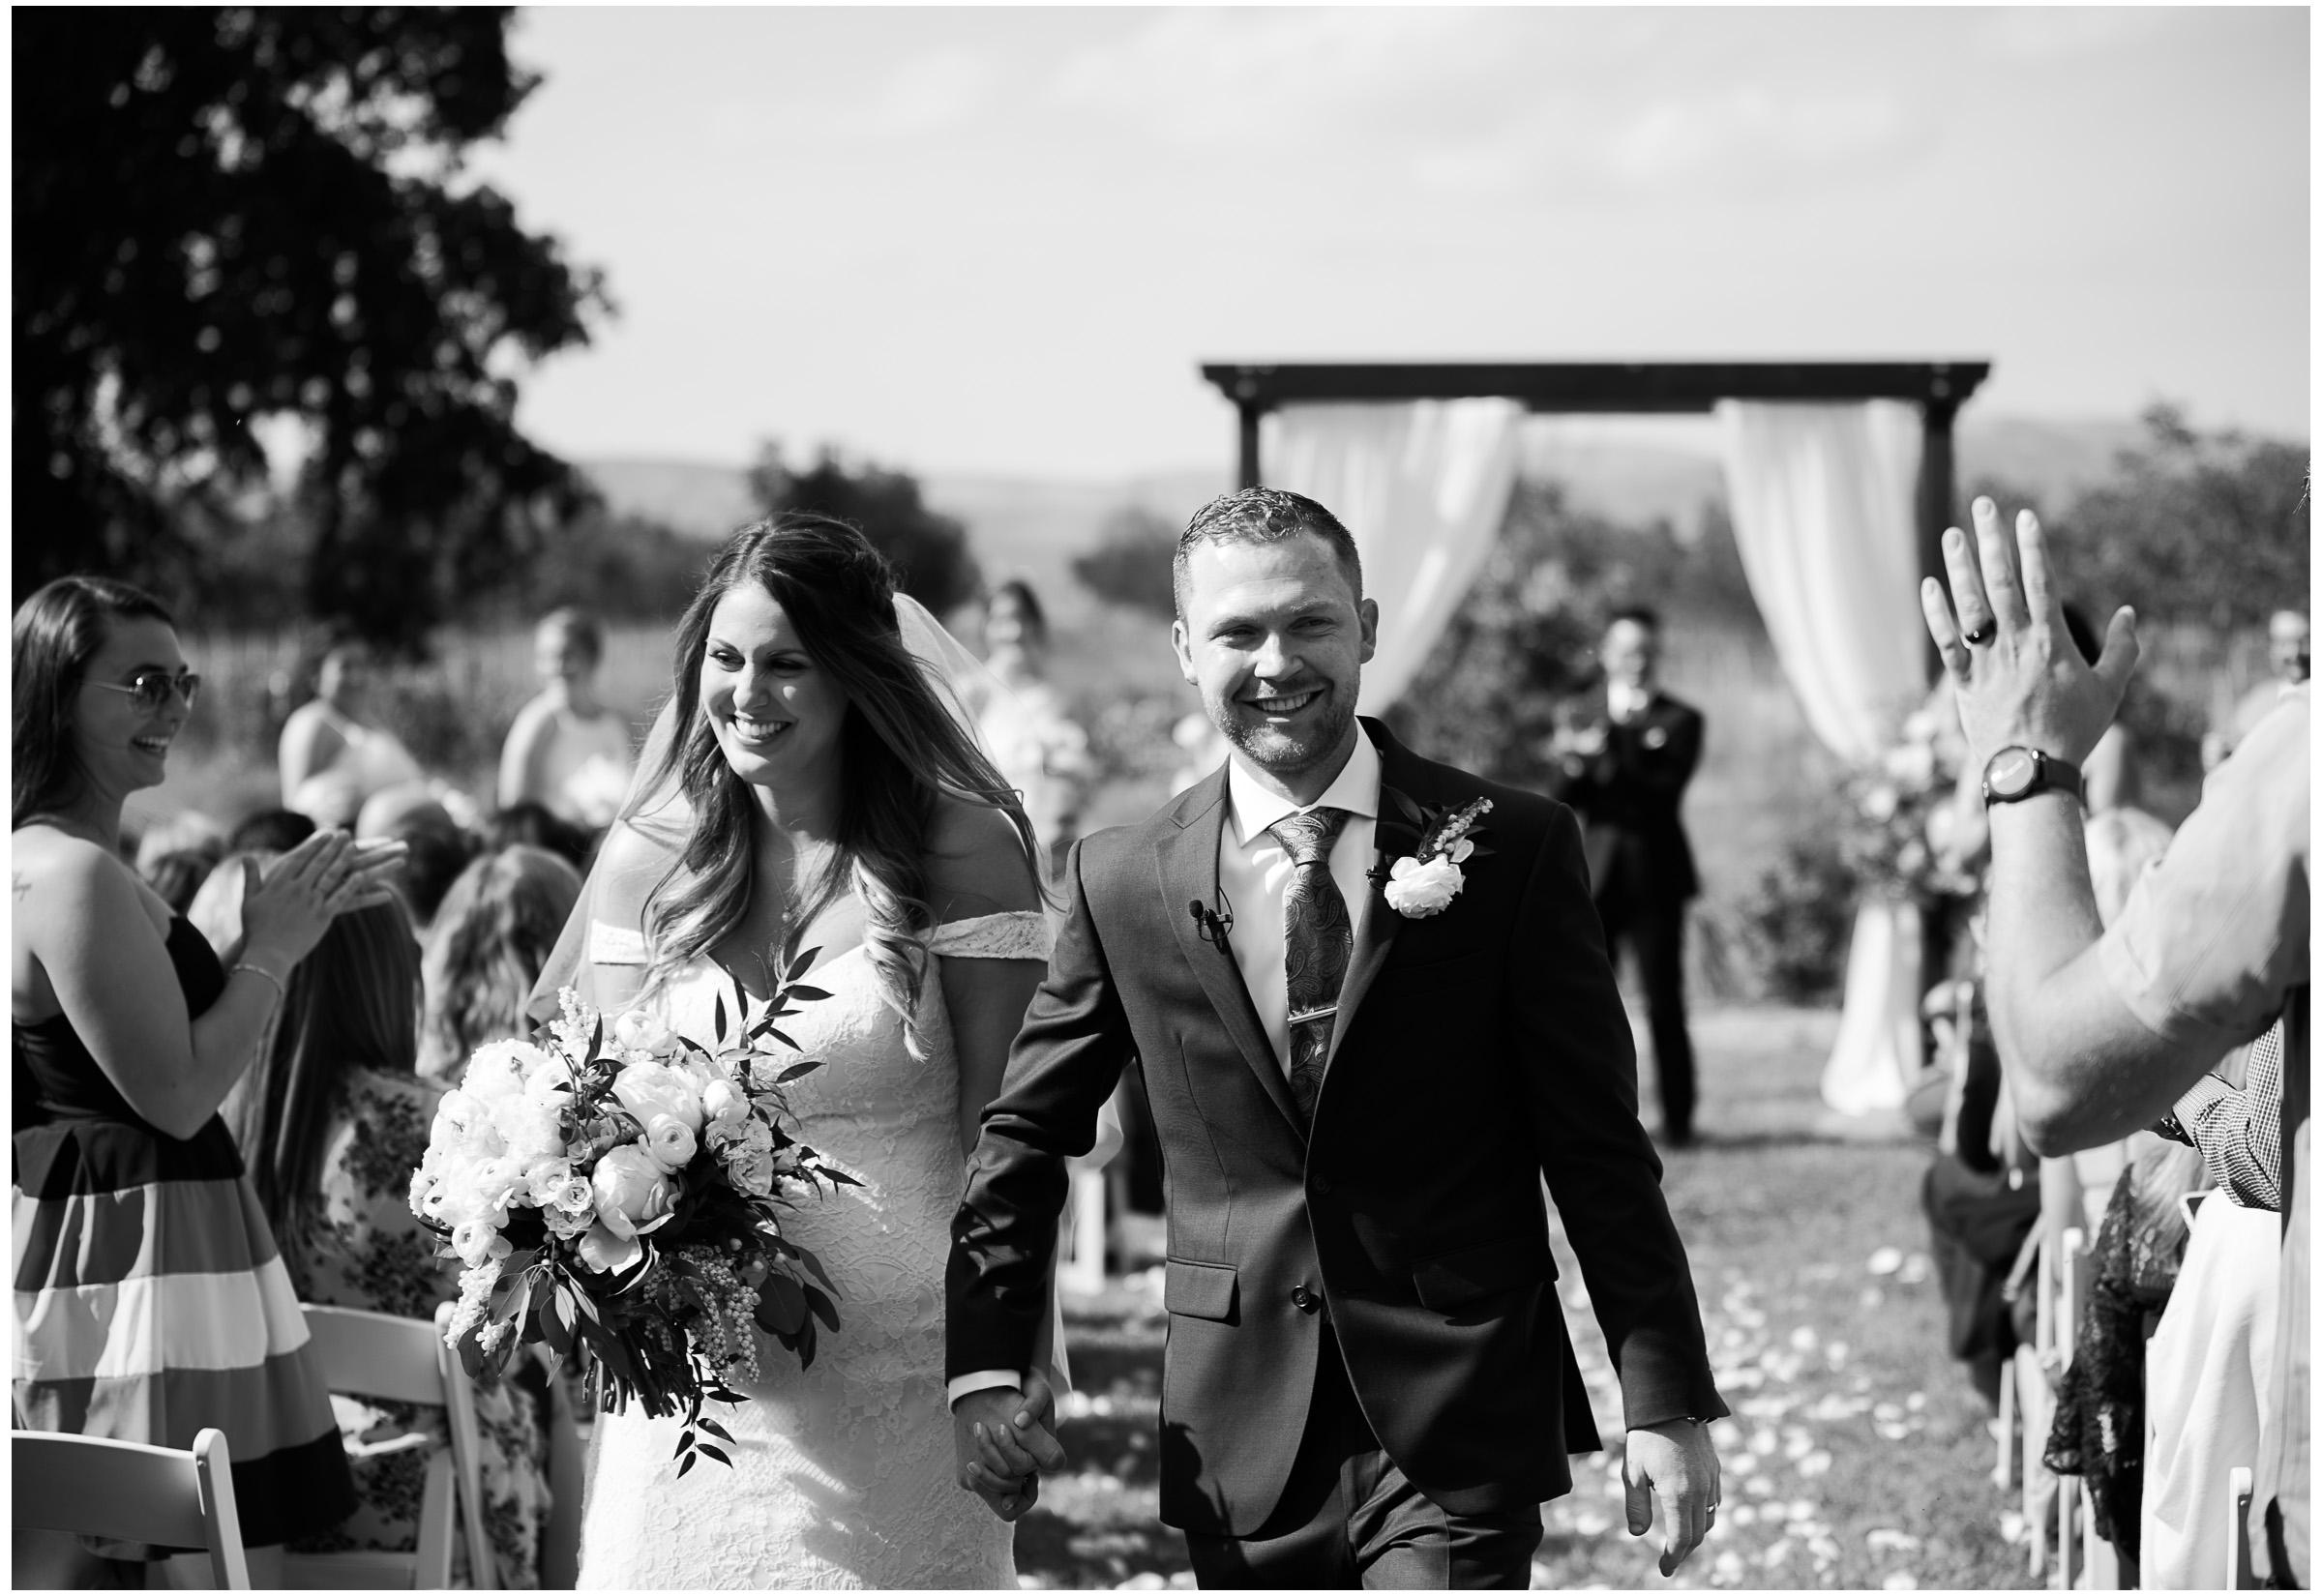 Winters Wedding - Sacramento Photographer - Field & Pond - Justin Wilcox Photography - 28.jpg